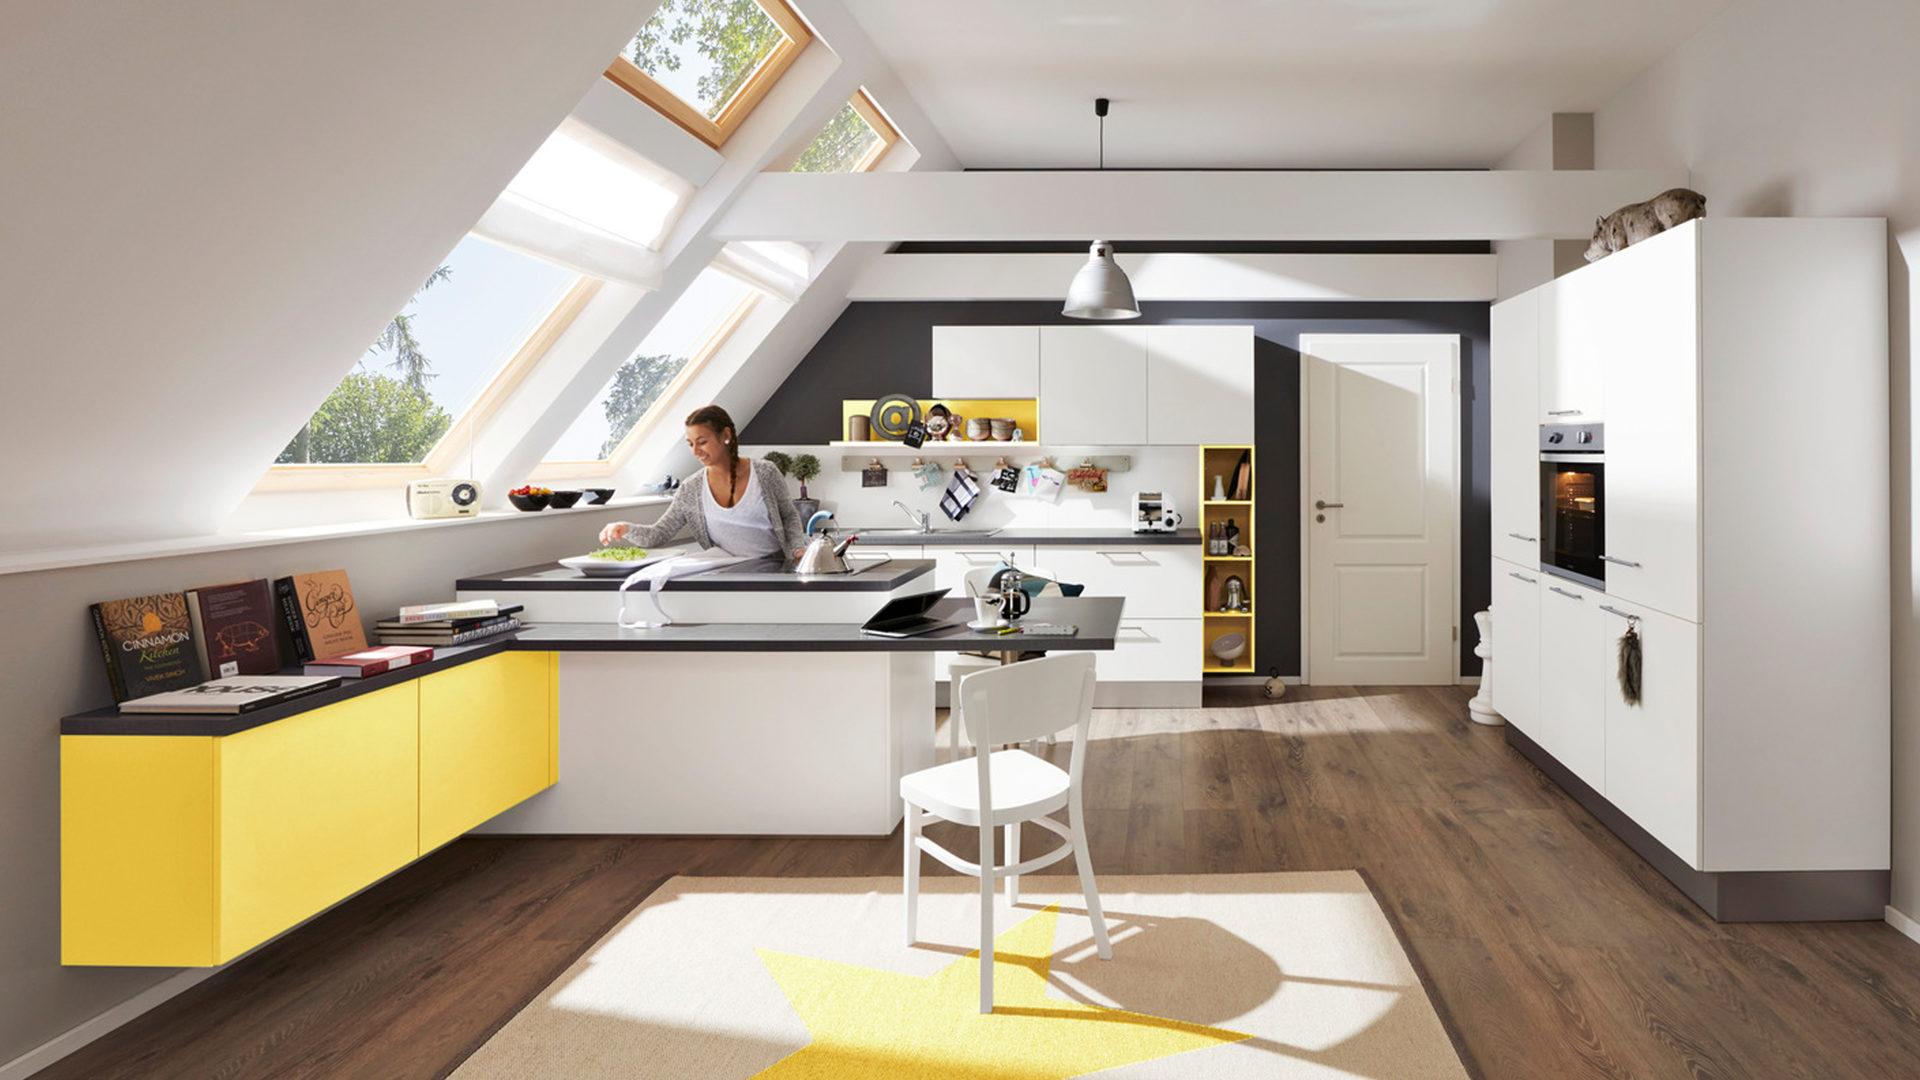 Möbel Boer Coesfeld, Möbel A-Z, Küchen, Einbauküche, Culineo